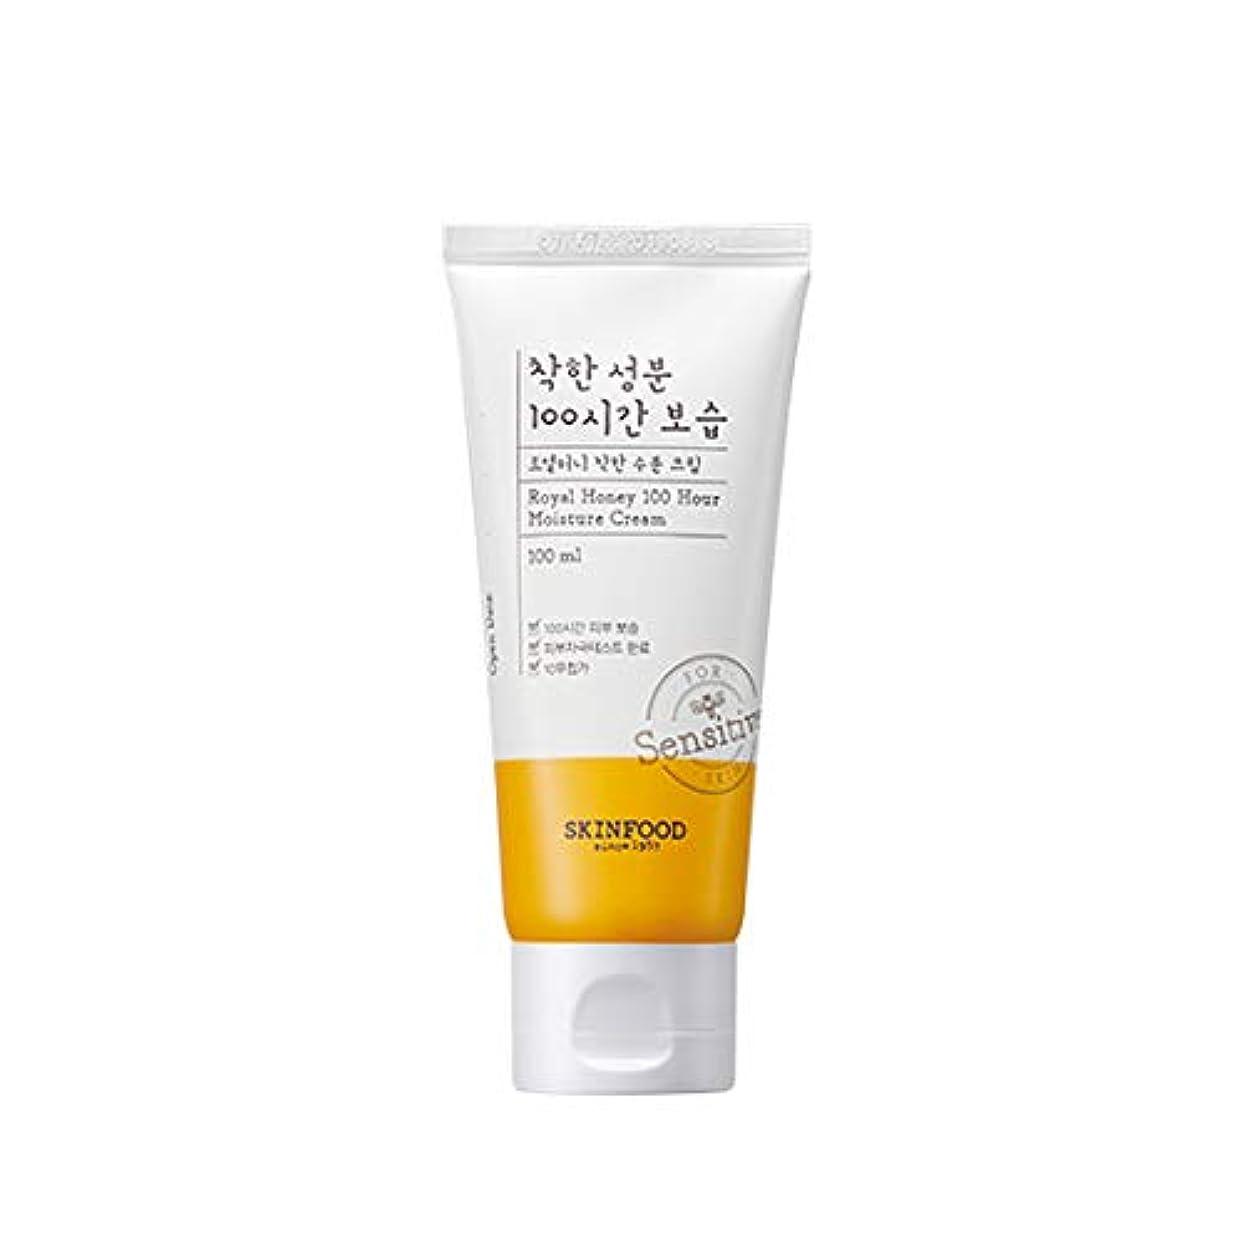 Skinfood ロイヤルハニー100時間モイスチャークリーム / Royal Honey 100 Hour Moisture Cream 100ml [並行輸入品]